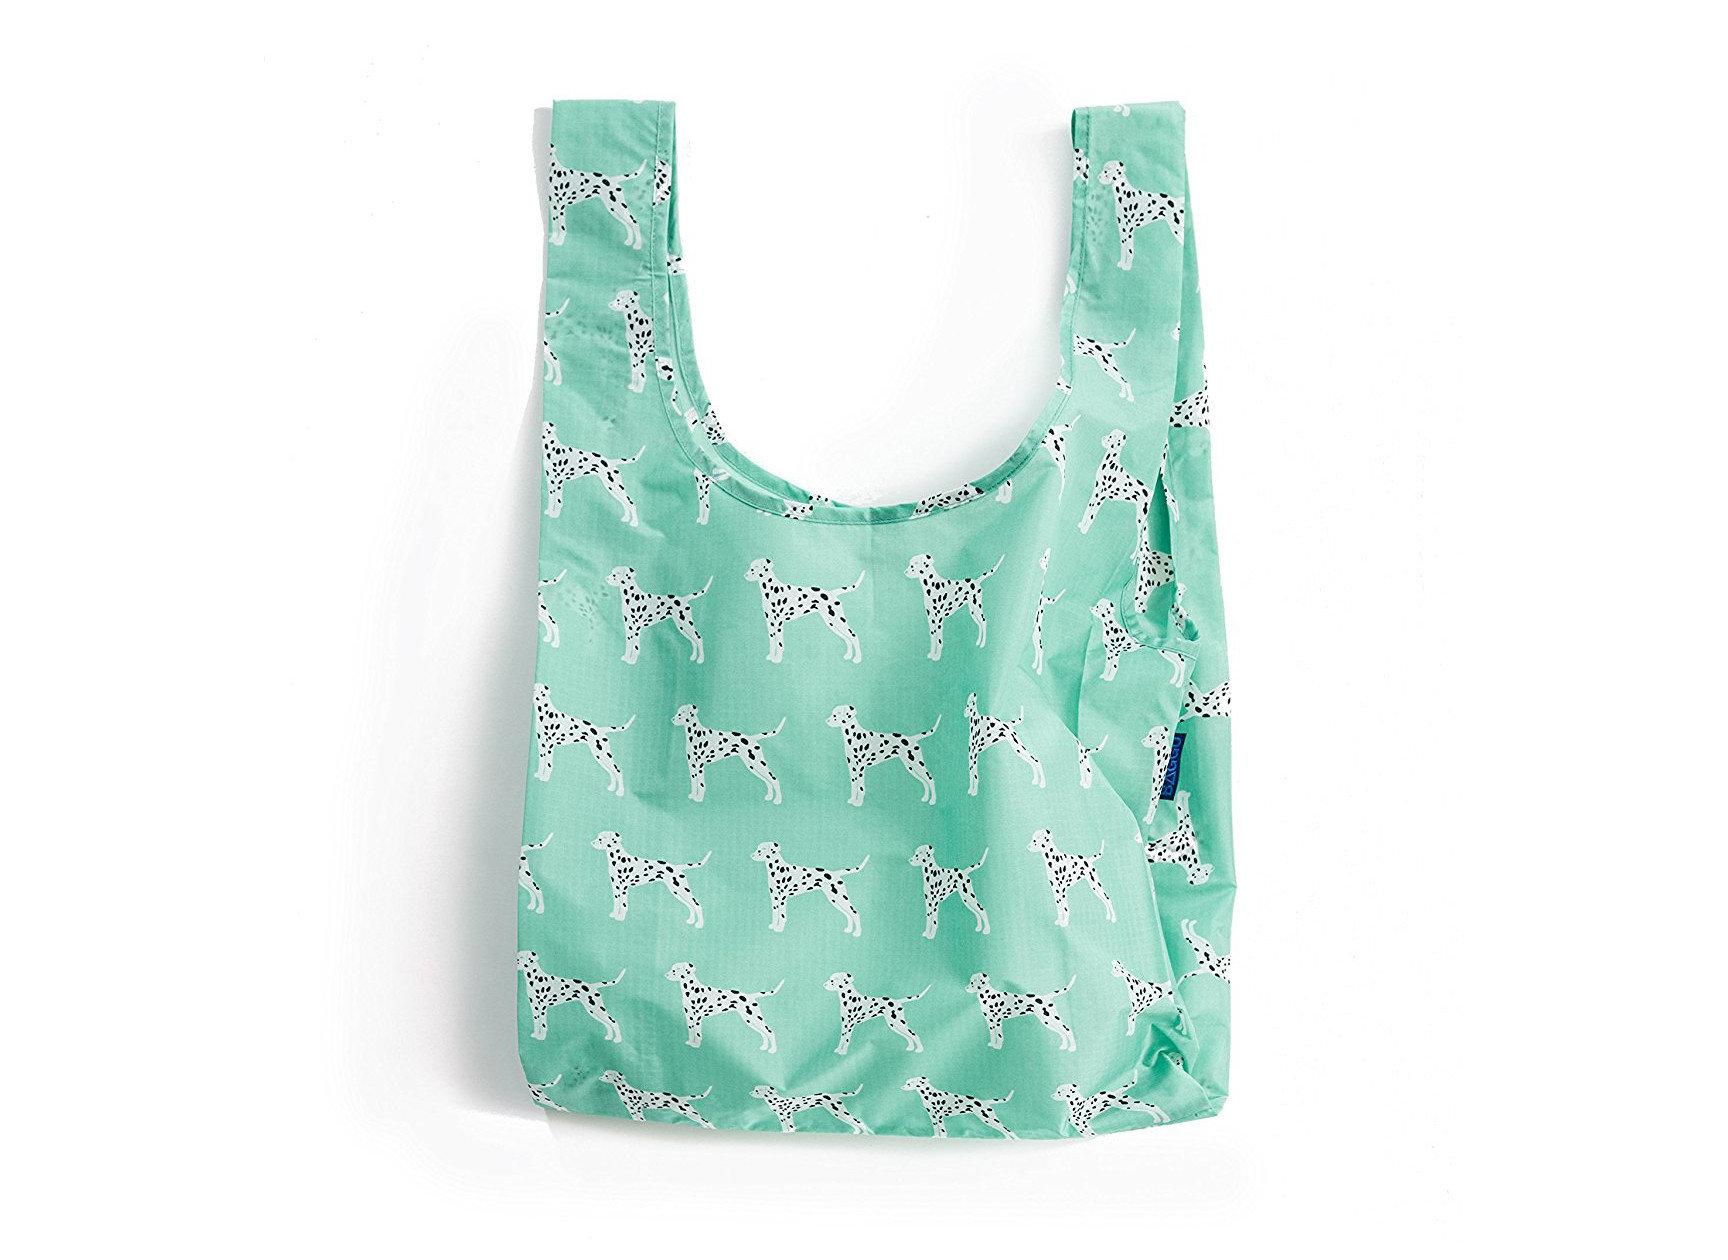 Travel Shop clothing bag product aqua handbag shoulder bag dress shopping bag turquoise packaging and labeling pattern tote bag